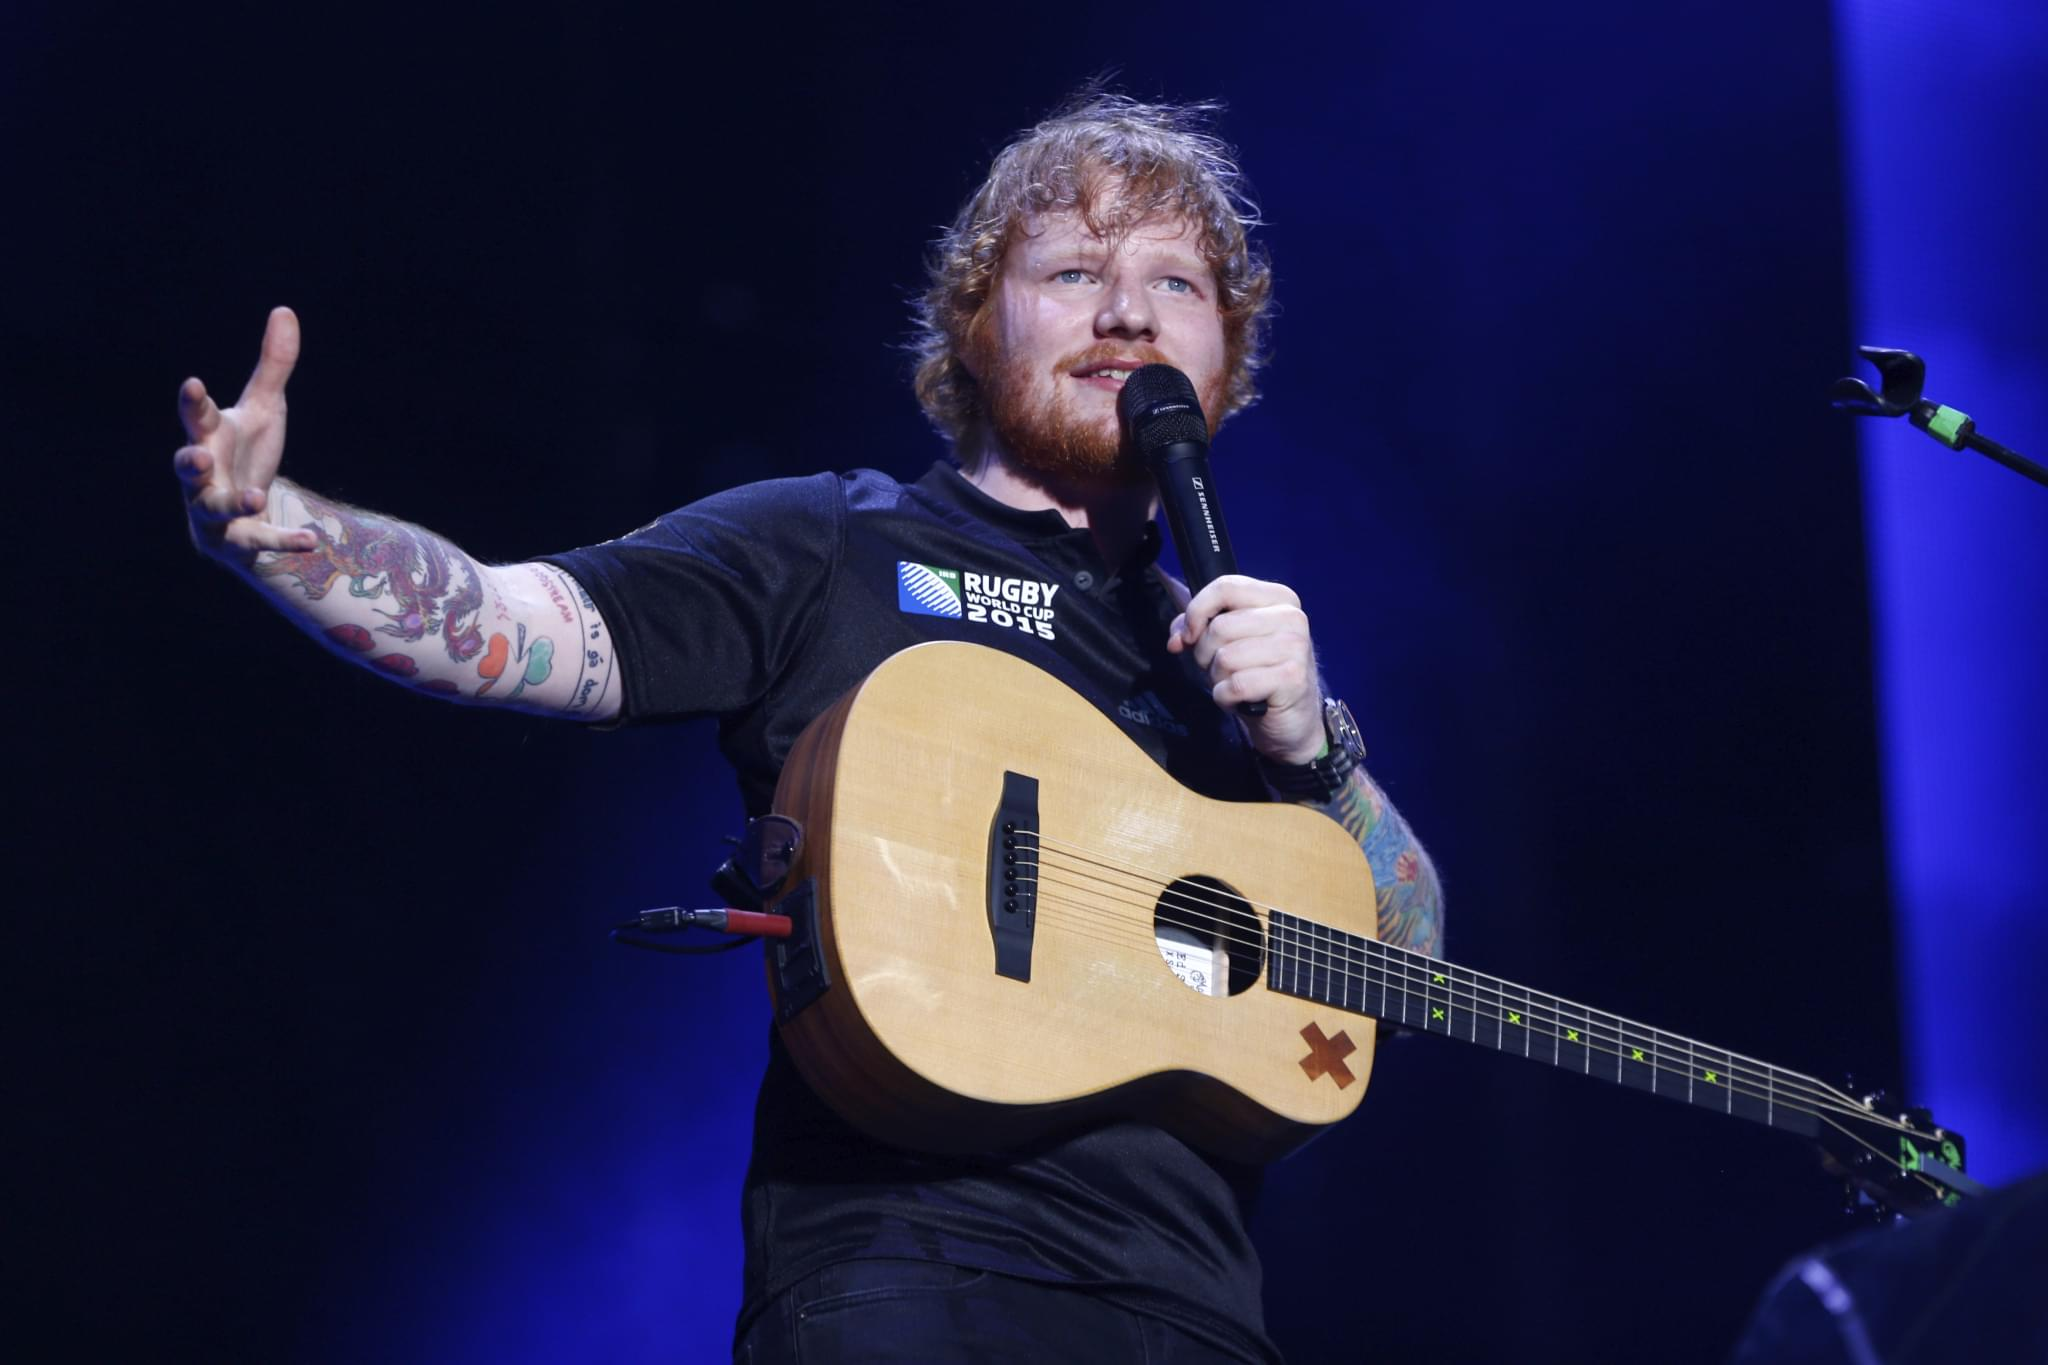 Ed Sheeran Talks About Addiction On Tour